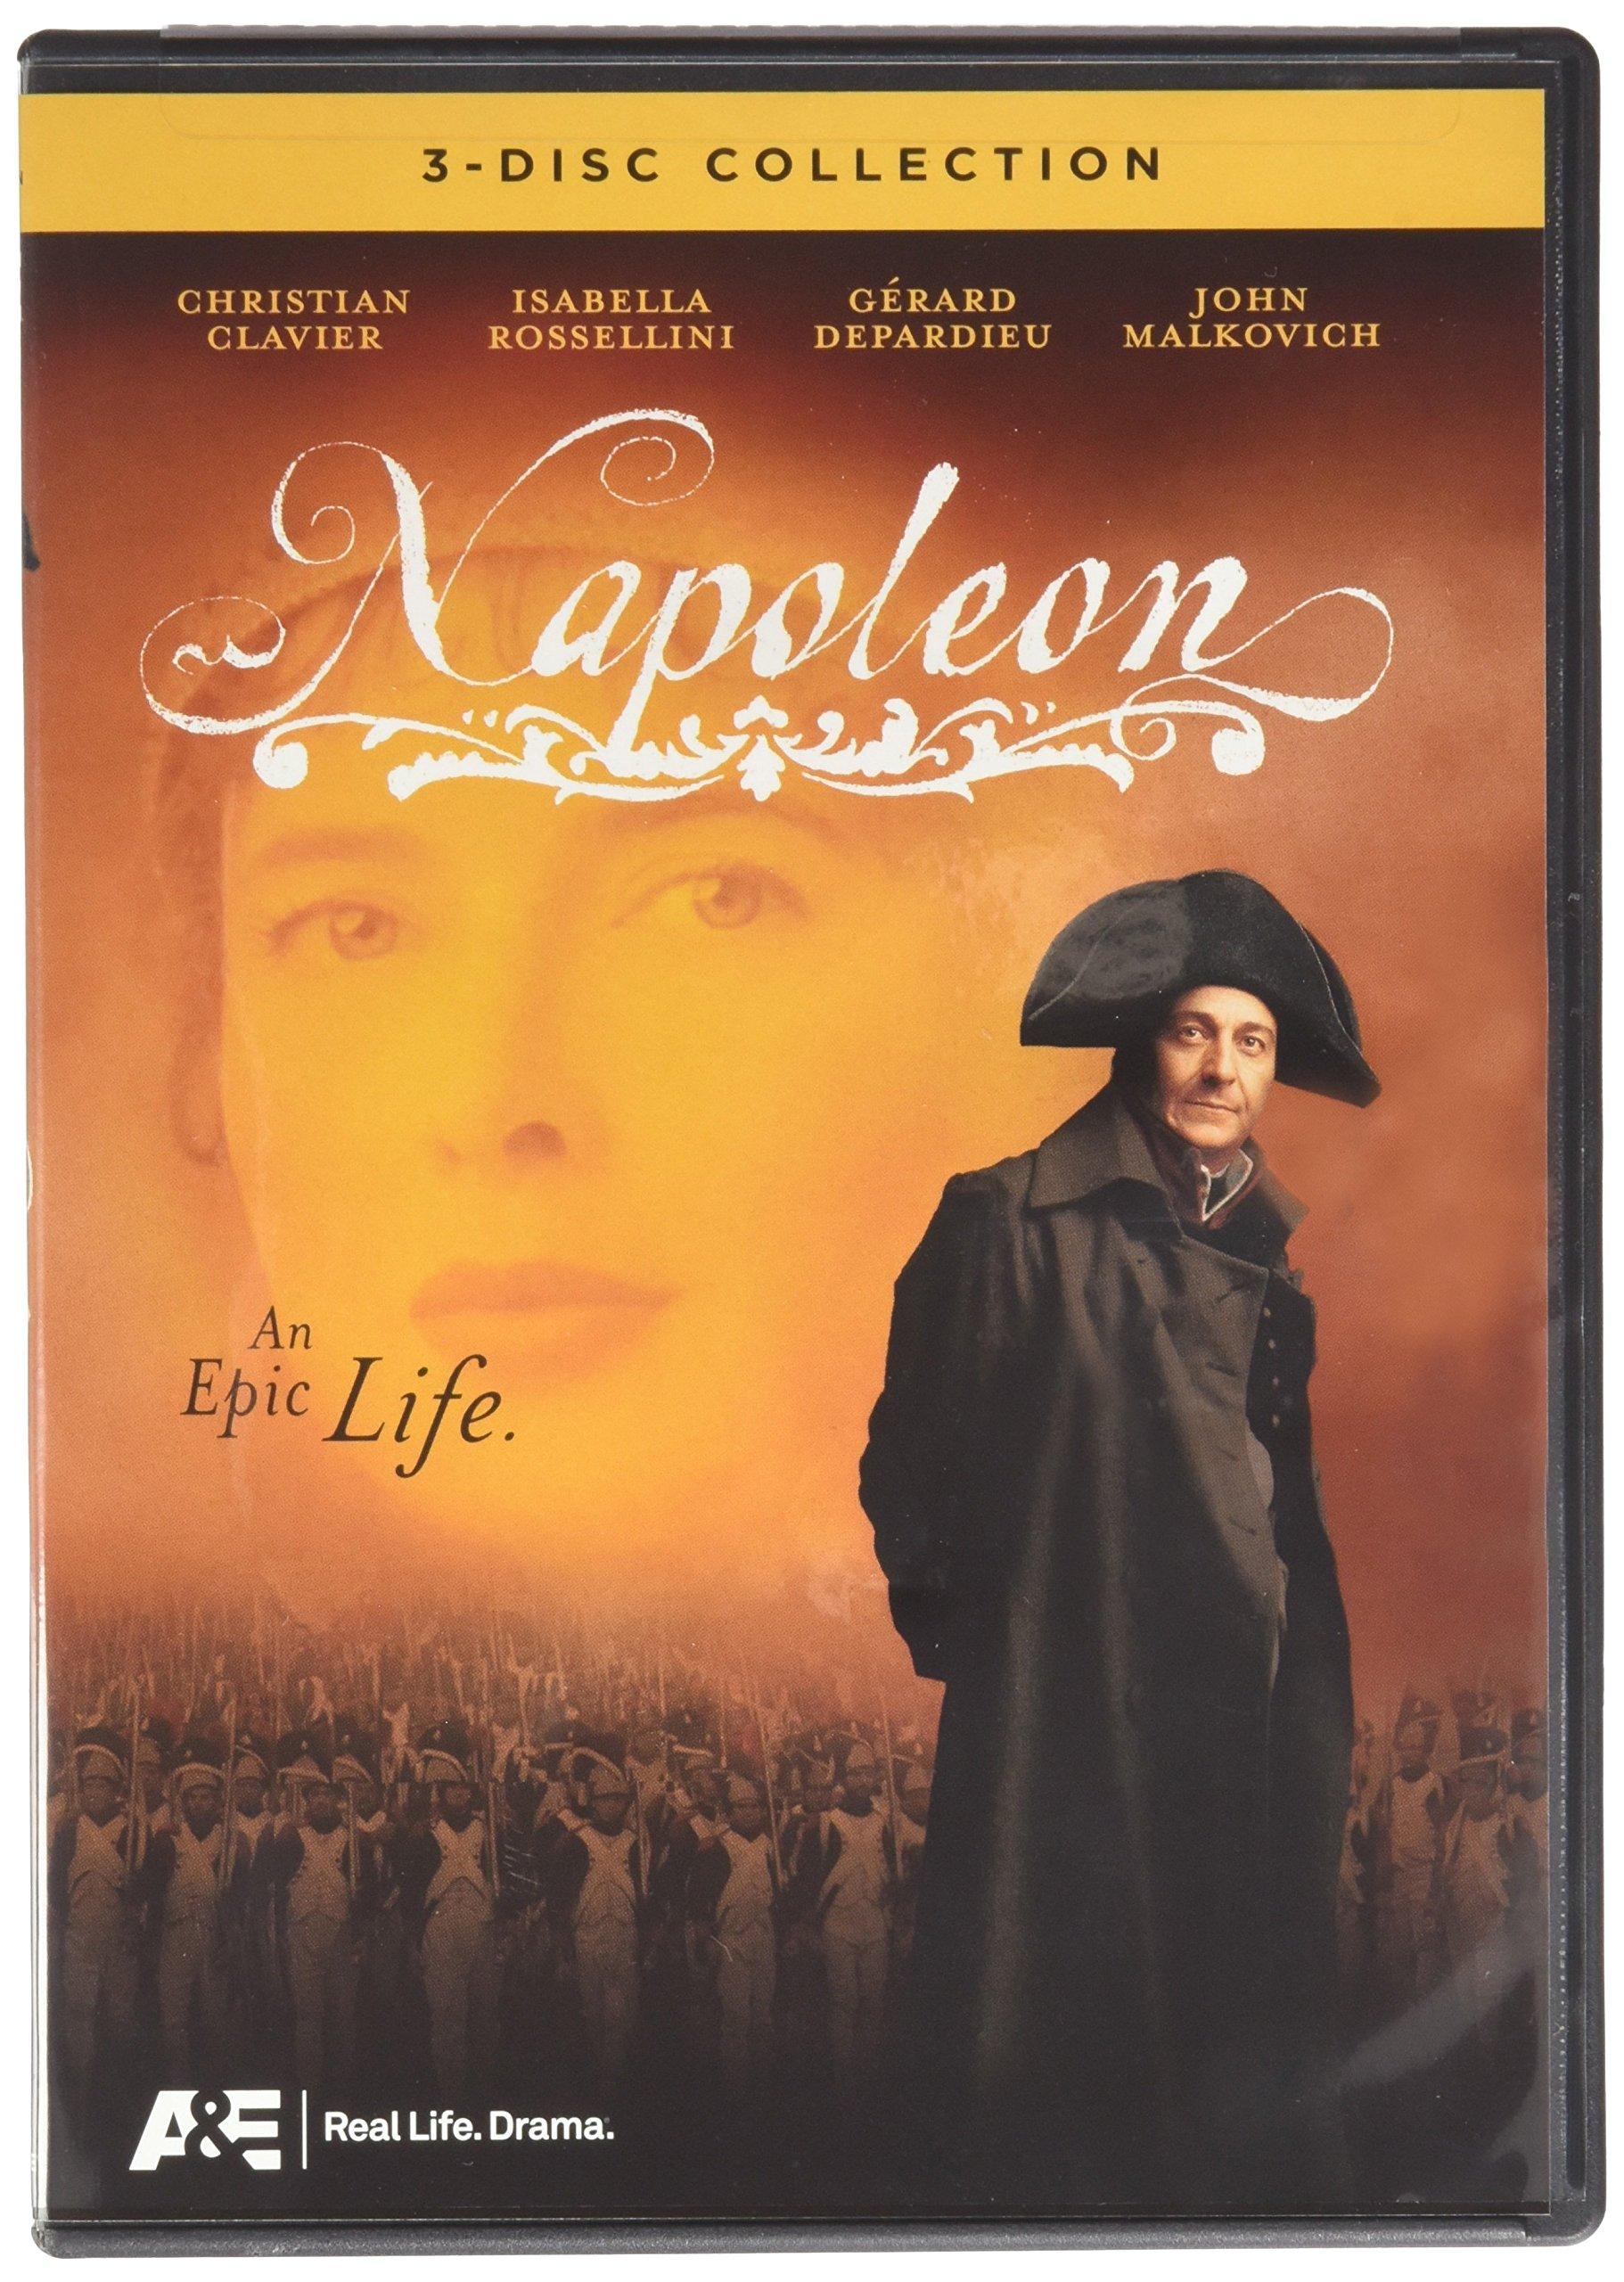 Napoleon (TV Miniseries) (3-Disc Collector's Edition) by A&E